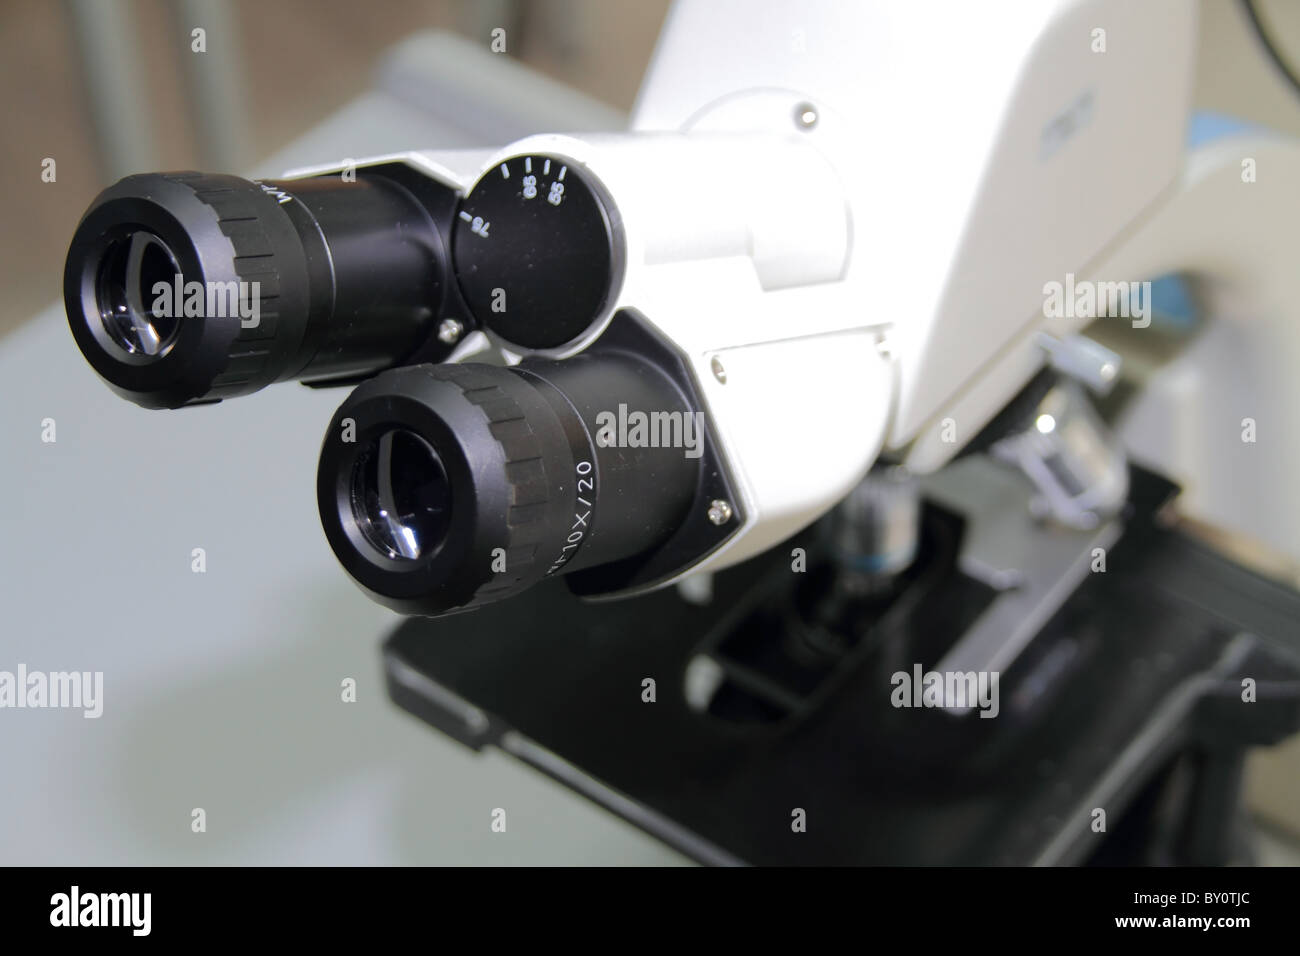 microscope in the laboratory - Stock Image